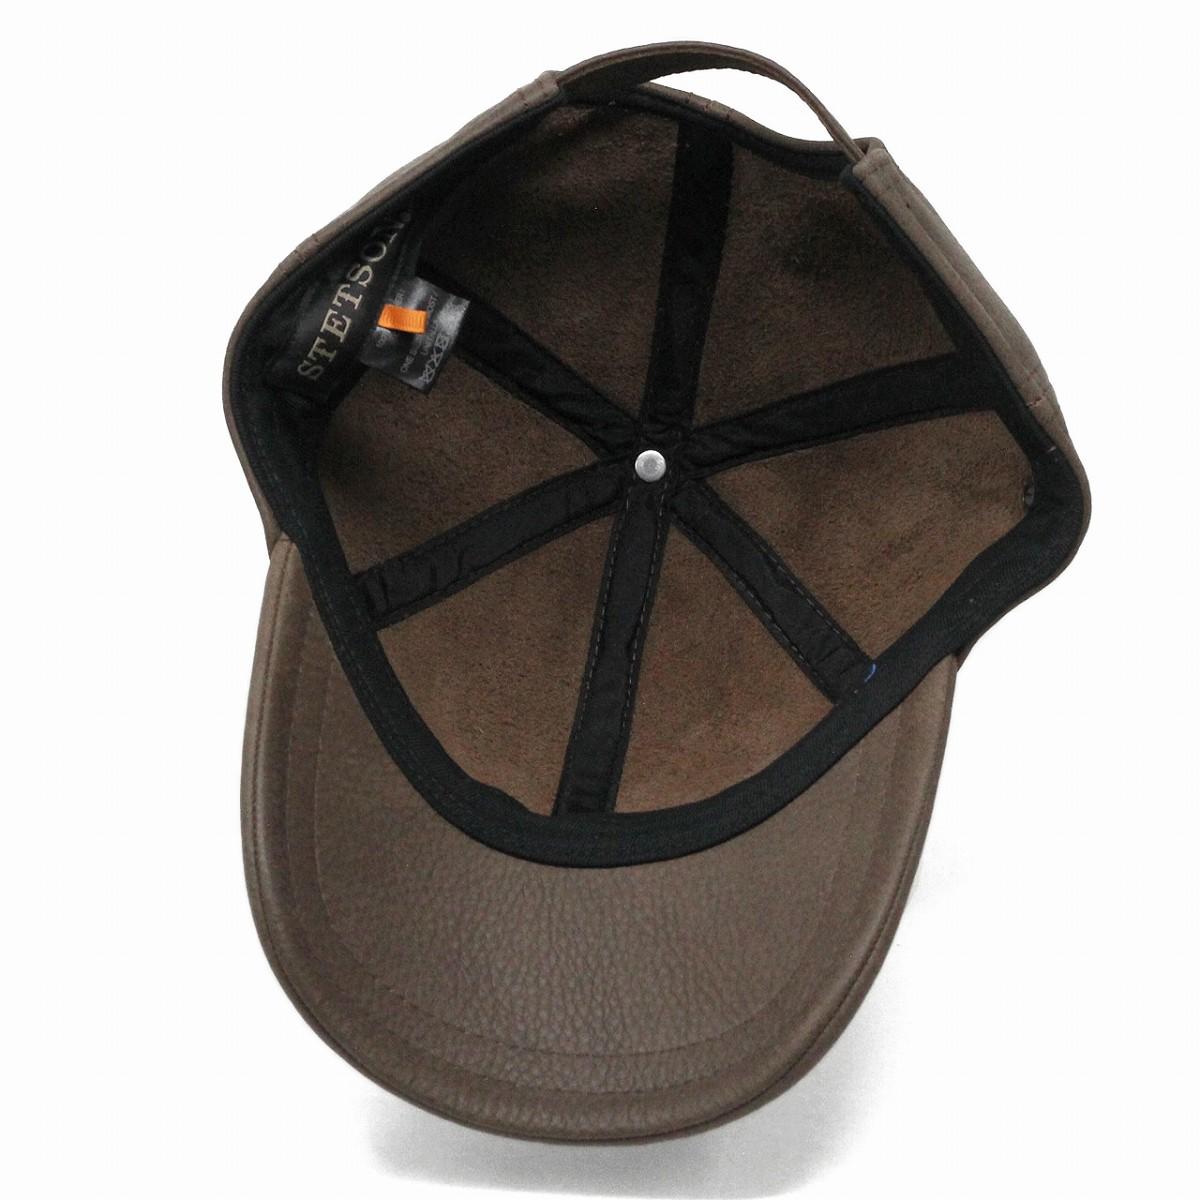 22adf180b07c1 Cap men s leather Stetson Cap leather oily timber stetson Hat Stetson cap  leather leather Cap men size adjustable gift presents tea Brown (Cap and  hats ...